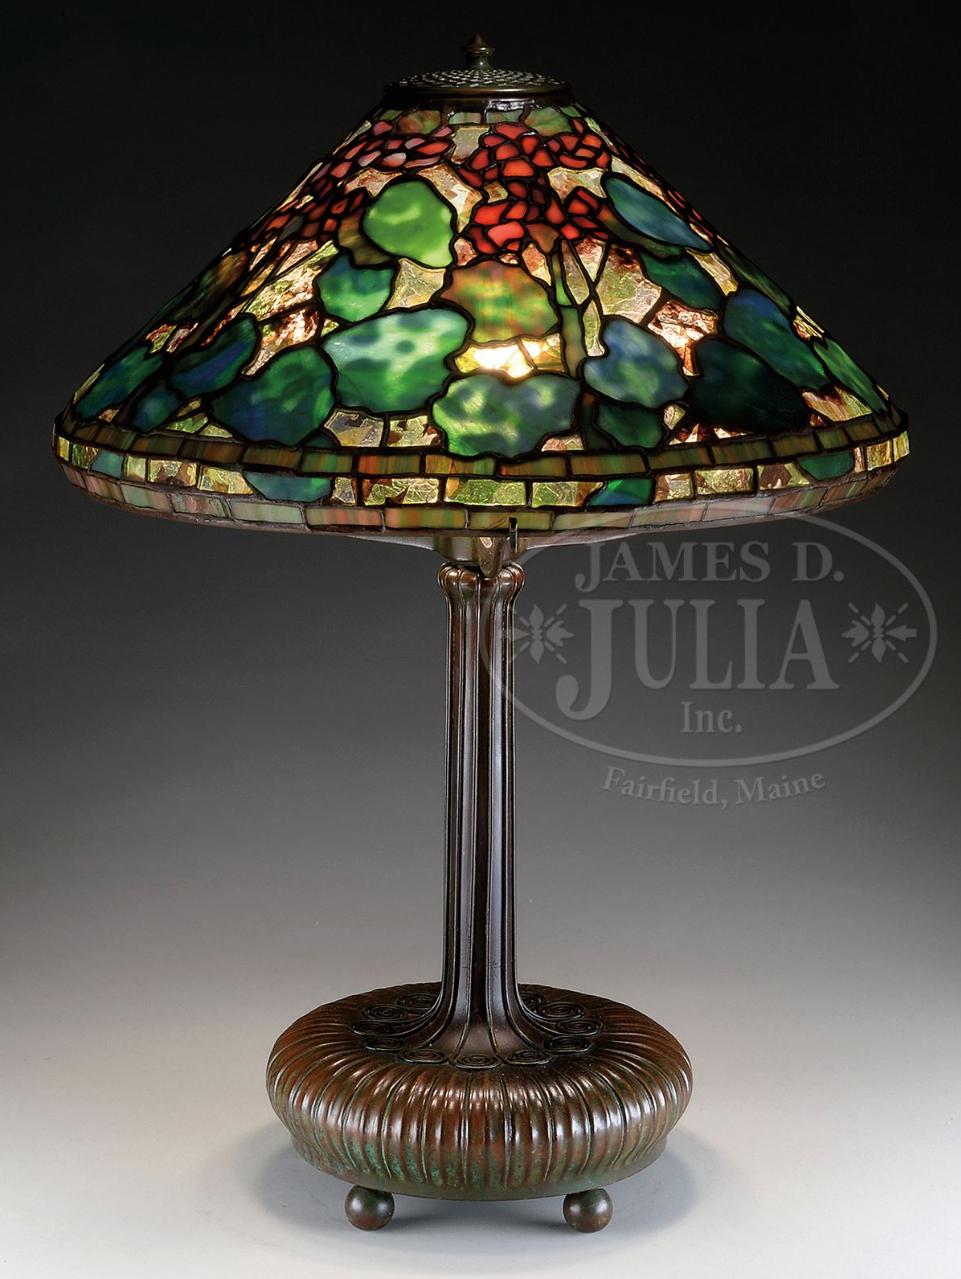 Tiffany Studios Geranium table lamp, Julia's lot #2005